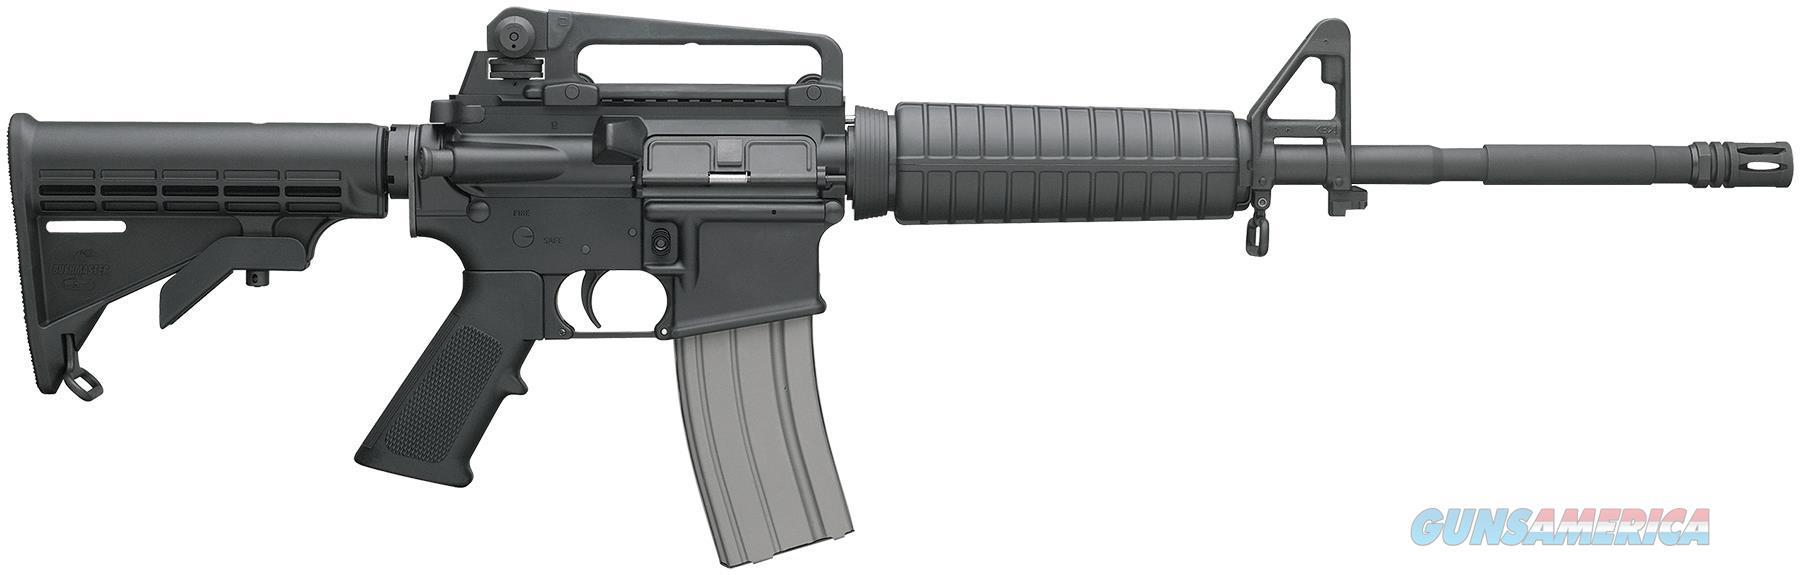 Bushmaster M4a3 Patrolman Carb 223 90289  Guns > Rifles > B Misc Rifles